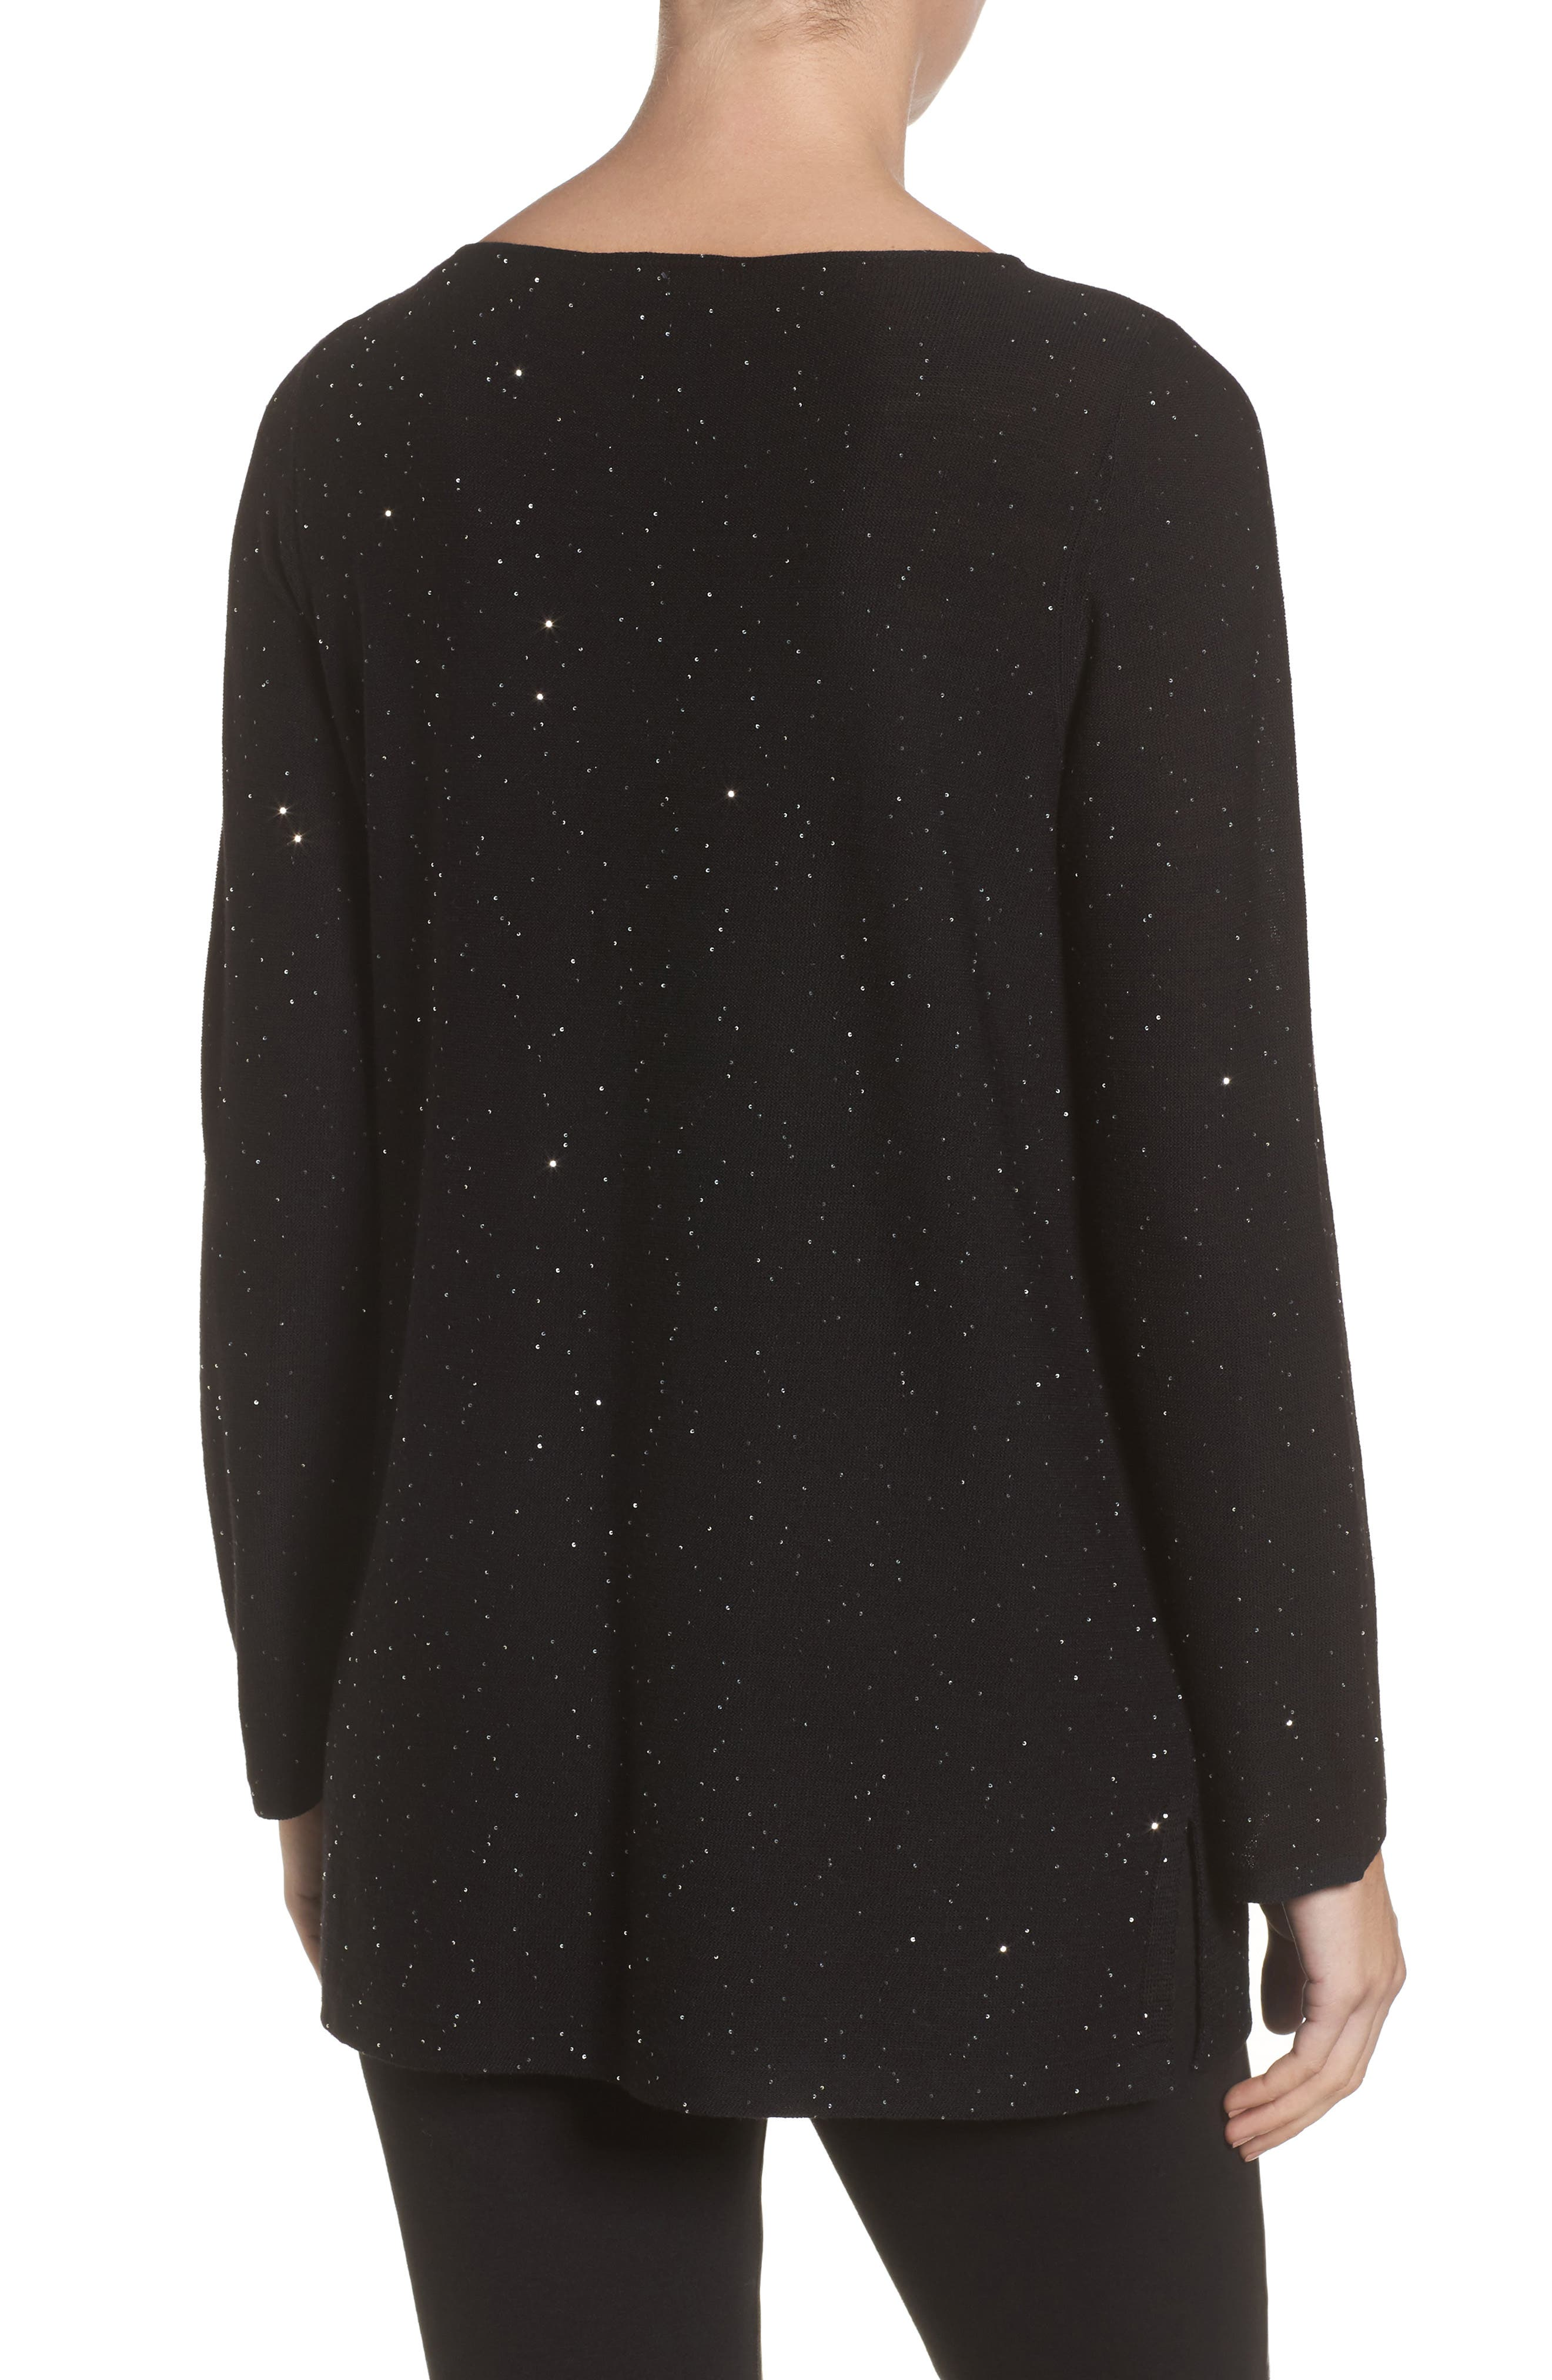 Sequin Merino Wool Sweater,                             Alternate thumbnail 2, color,                             001